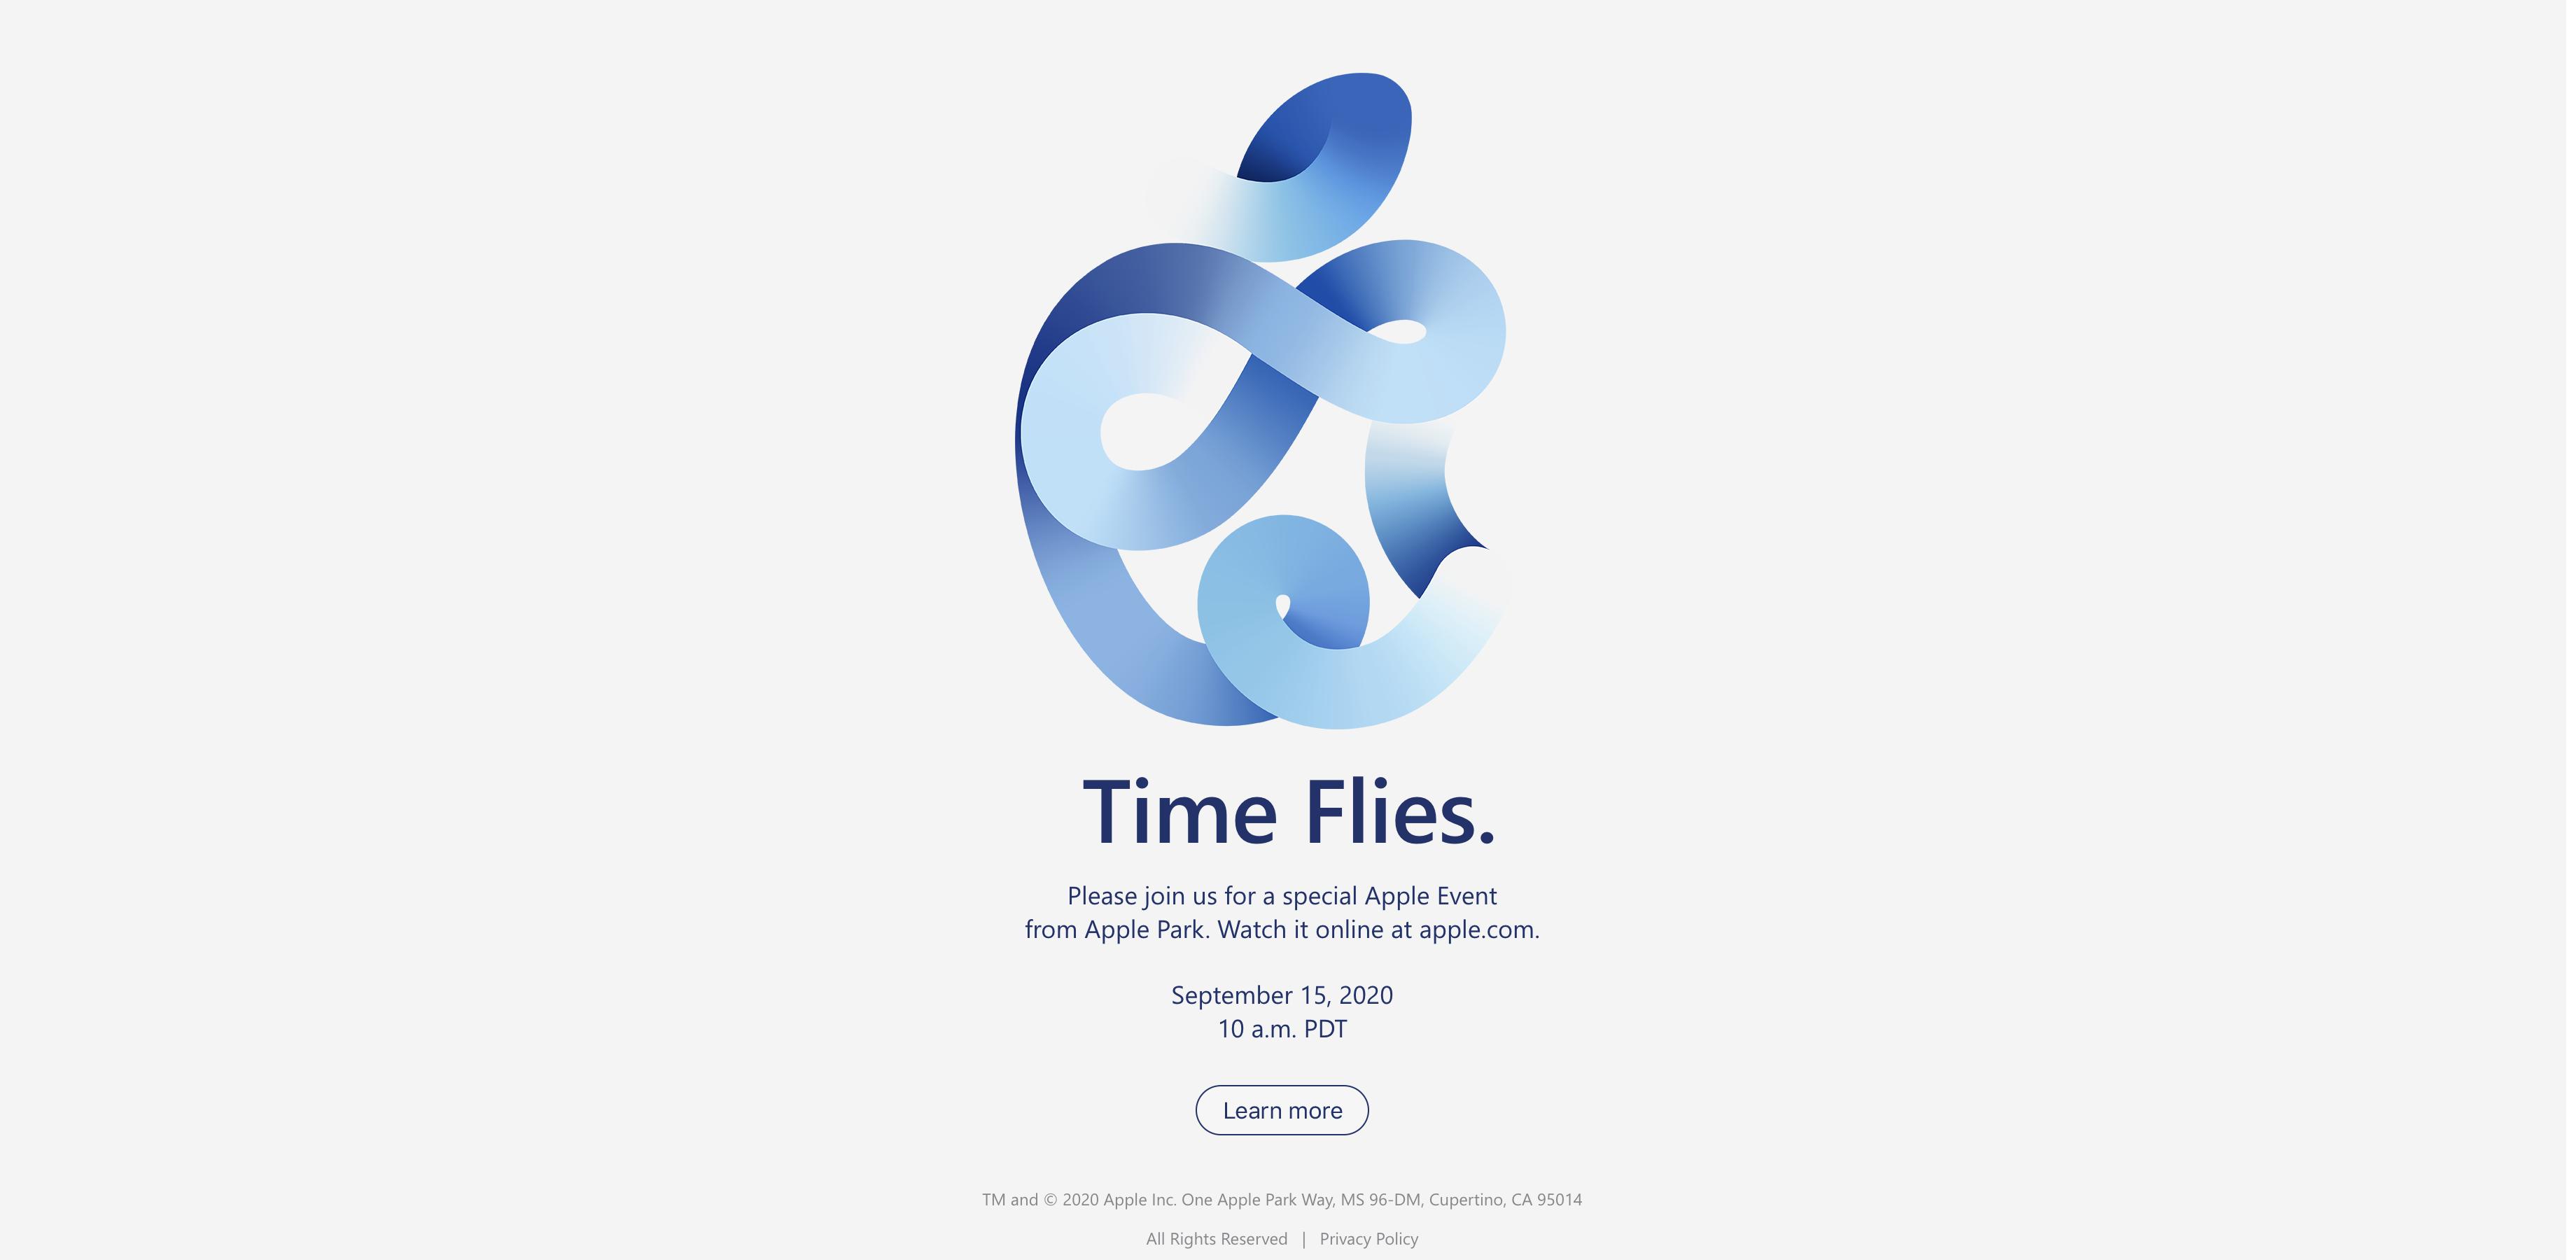 Apple Time Flies event